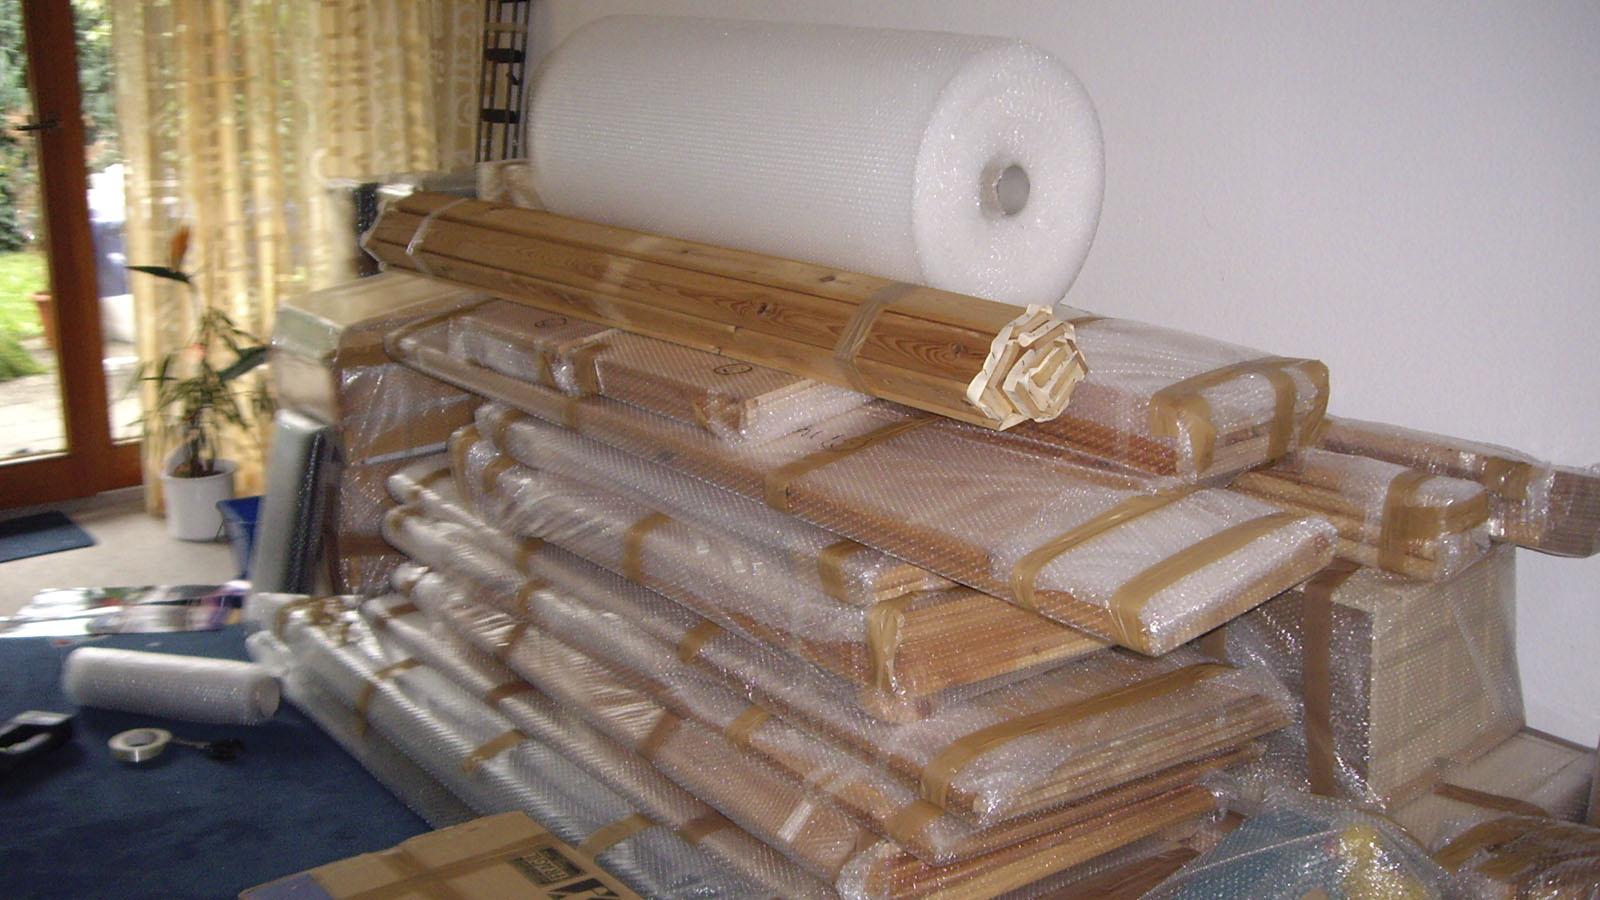 Vorbereitung der Packstücke